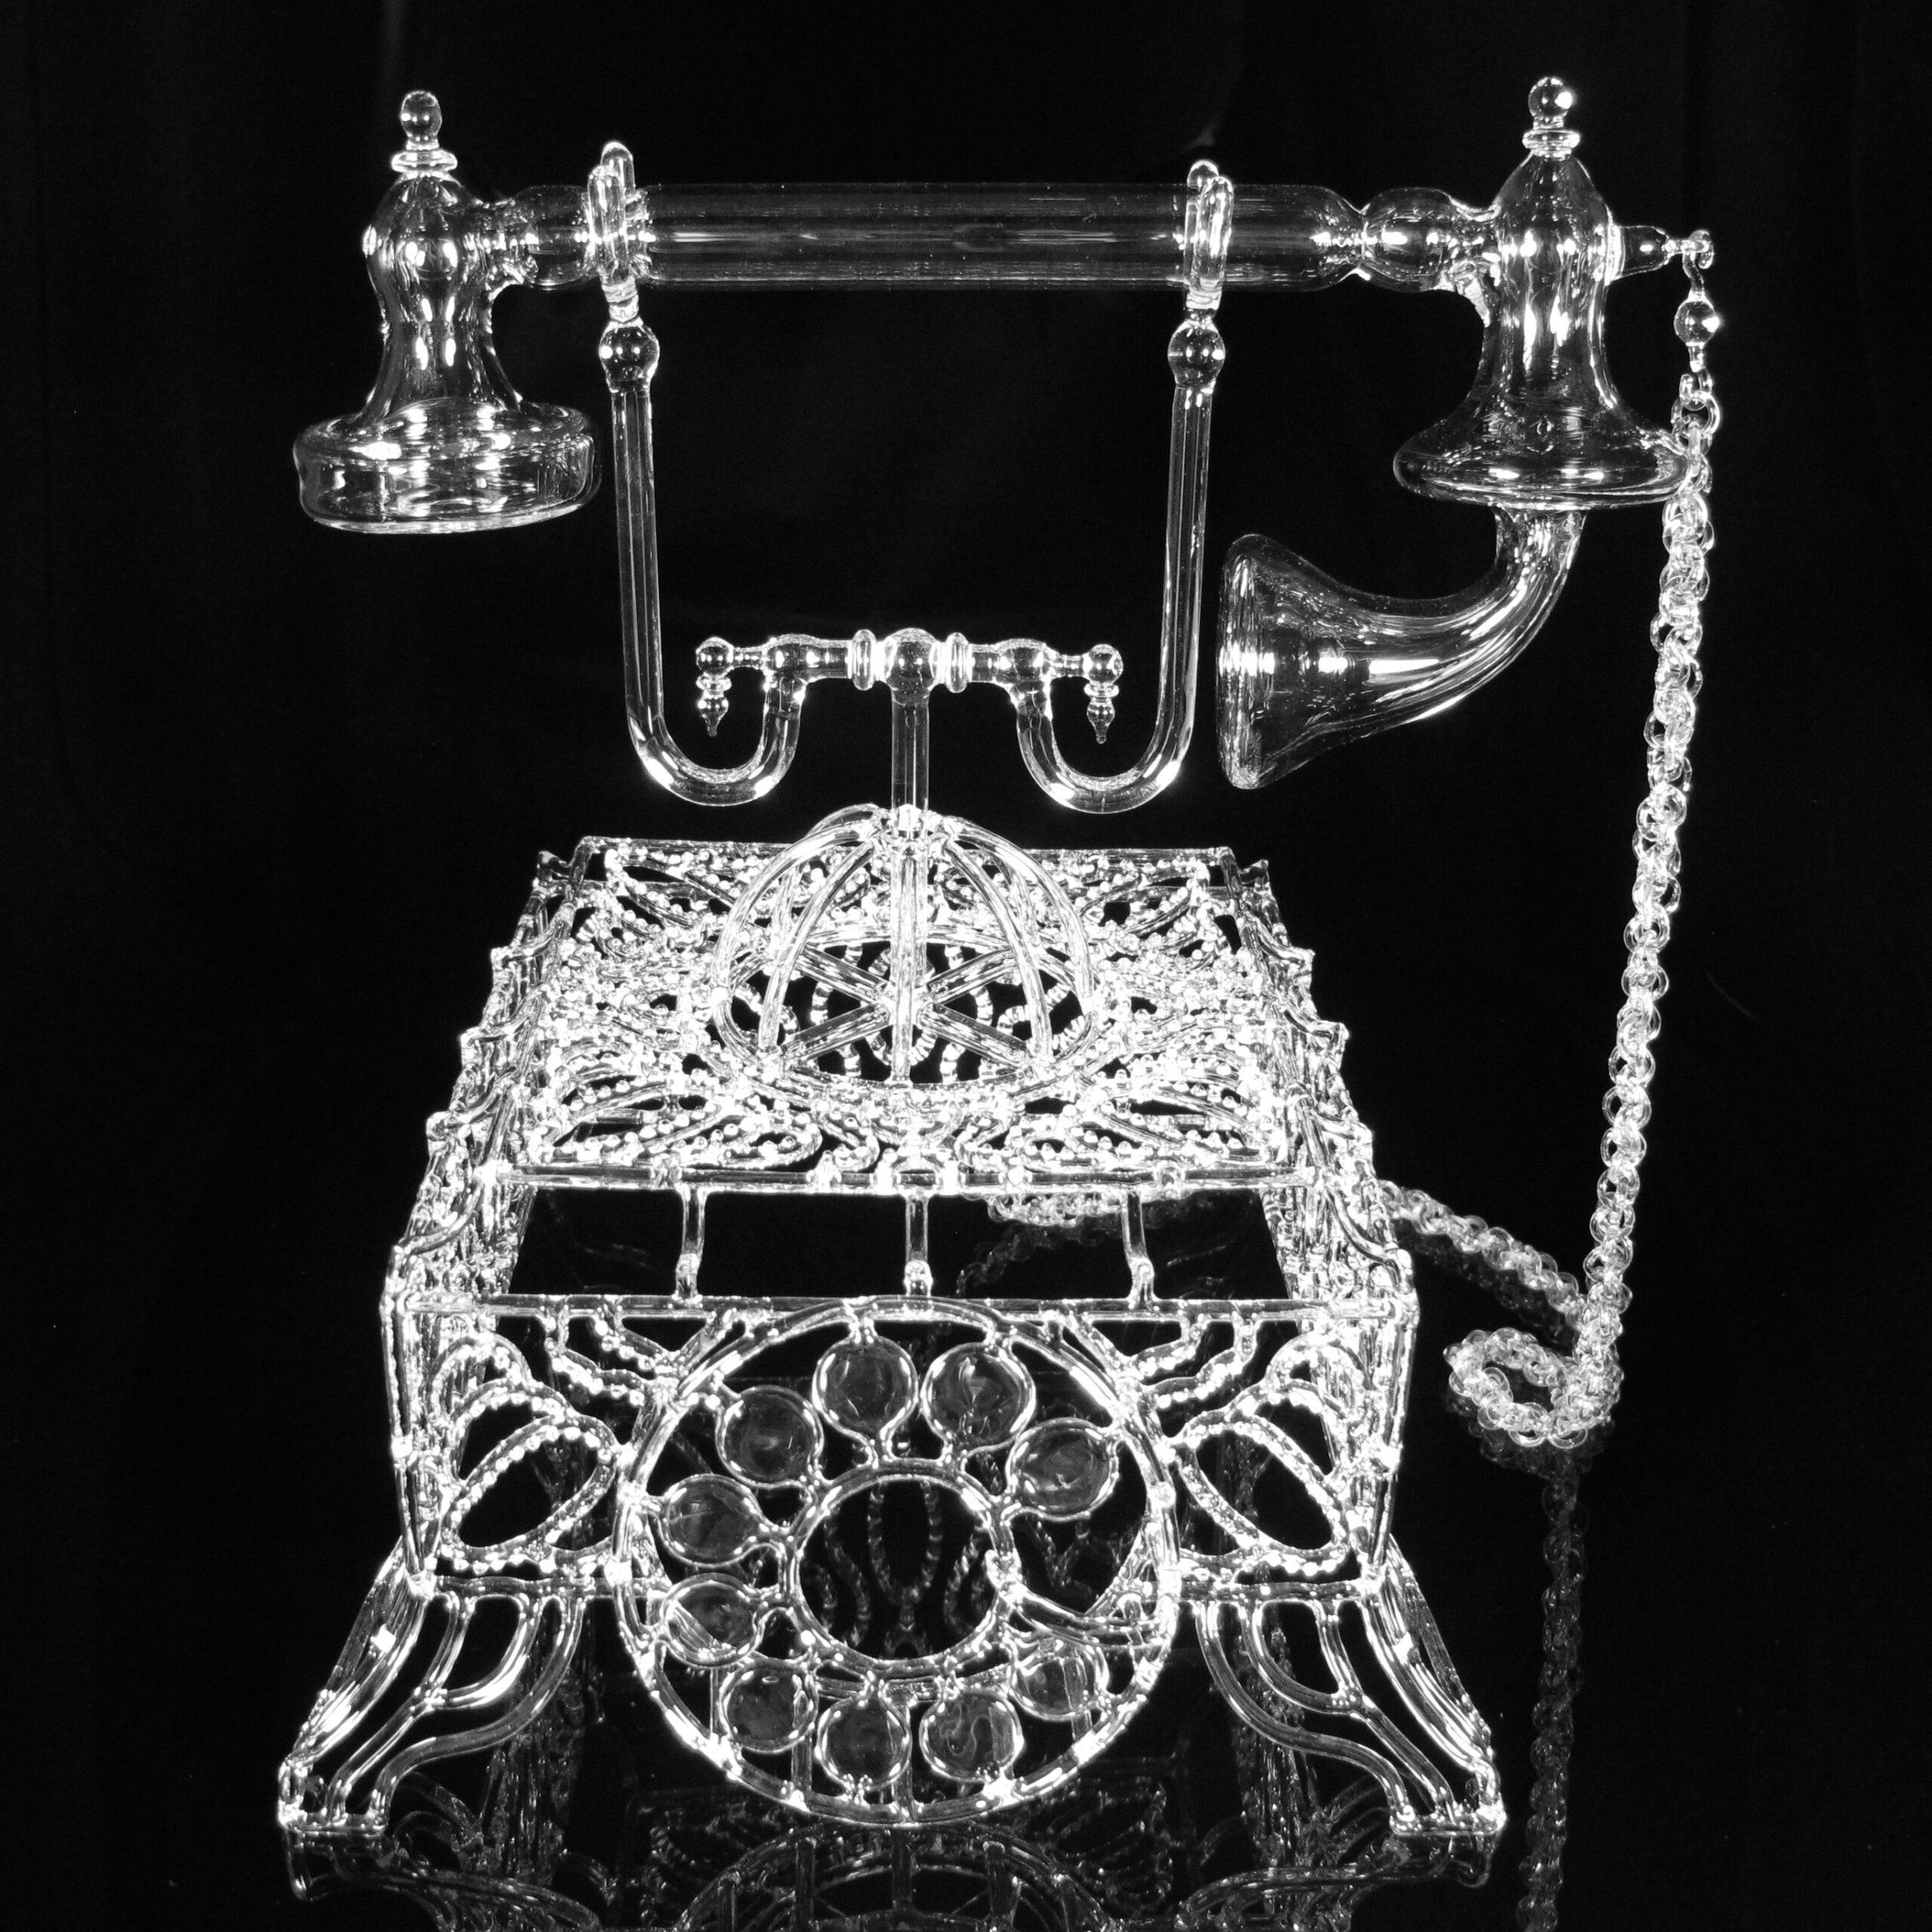 Telephone by Kit Paulson